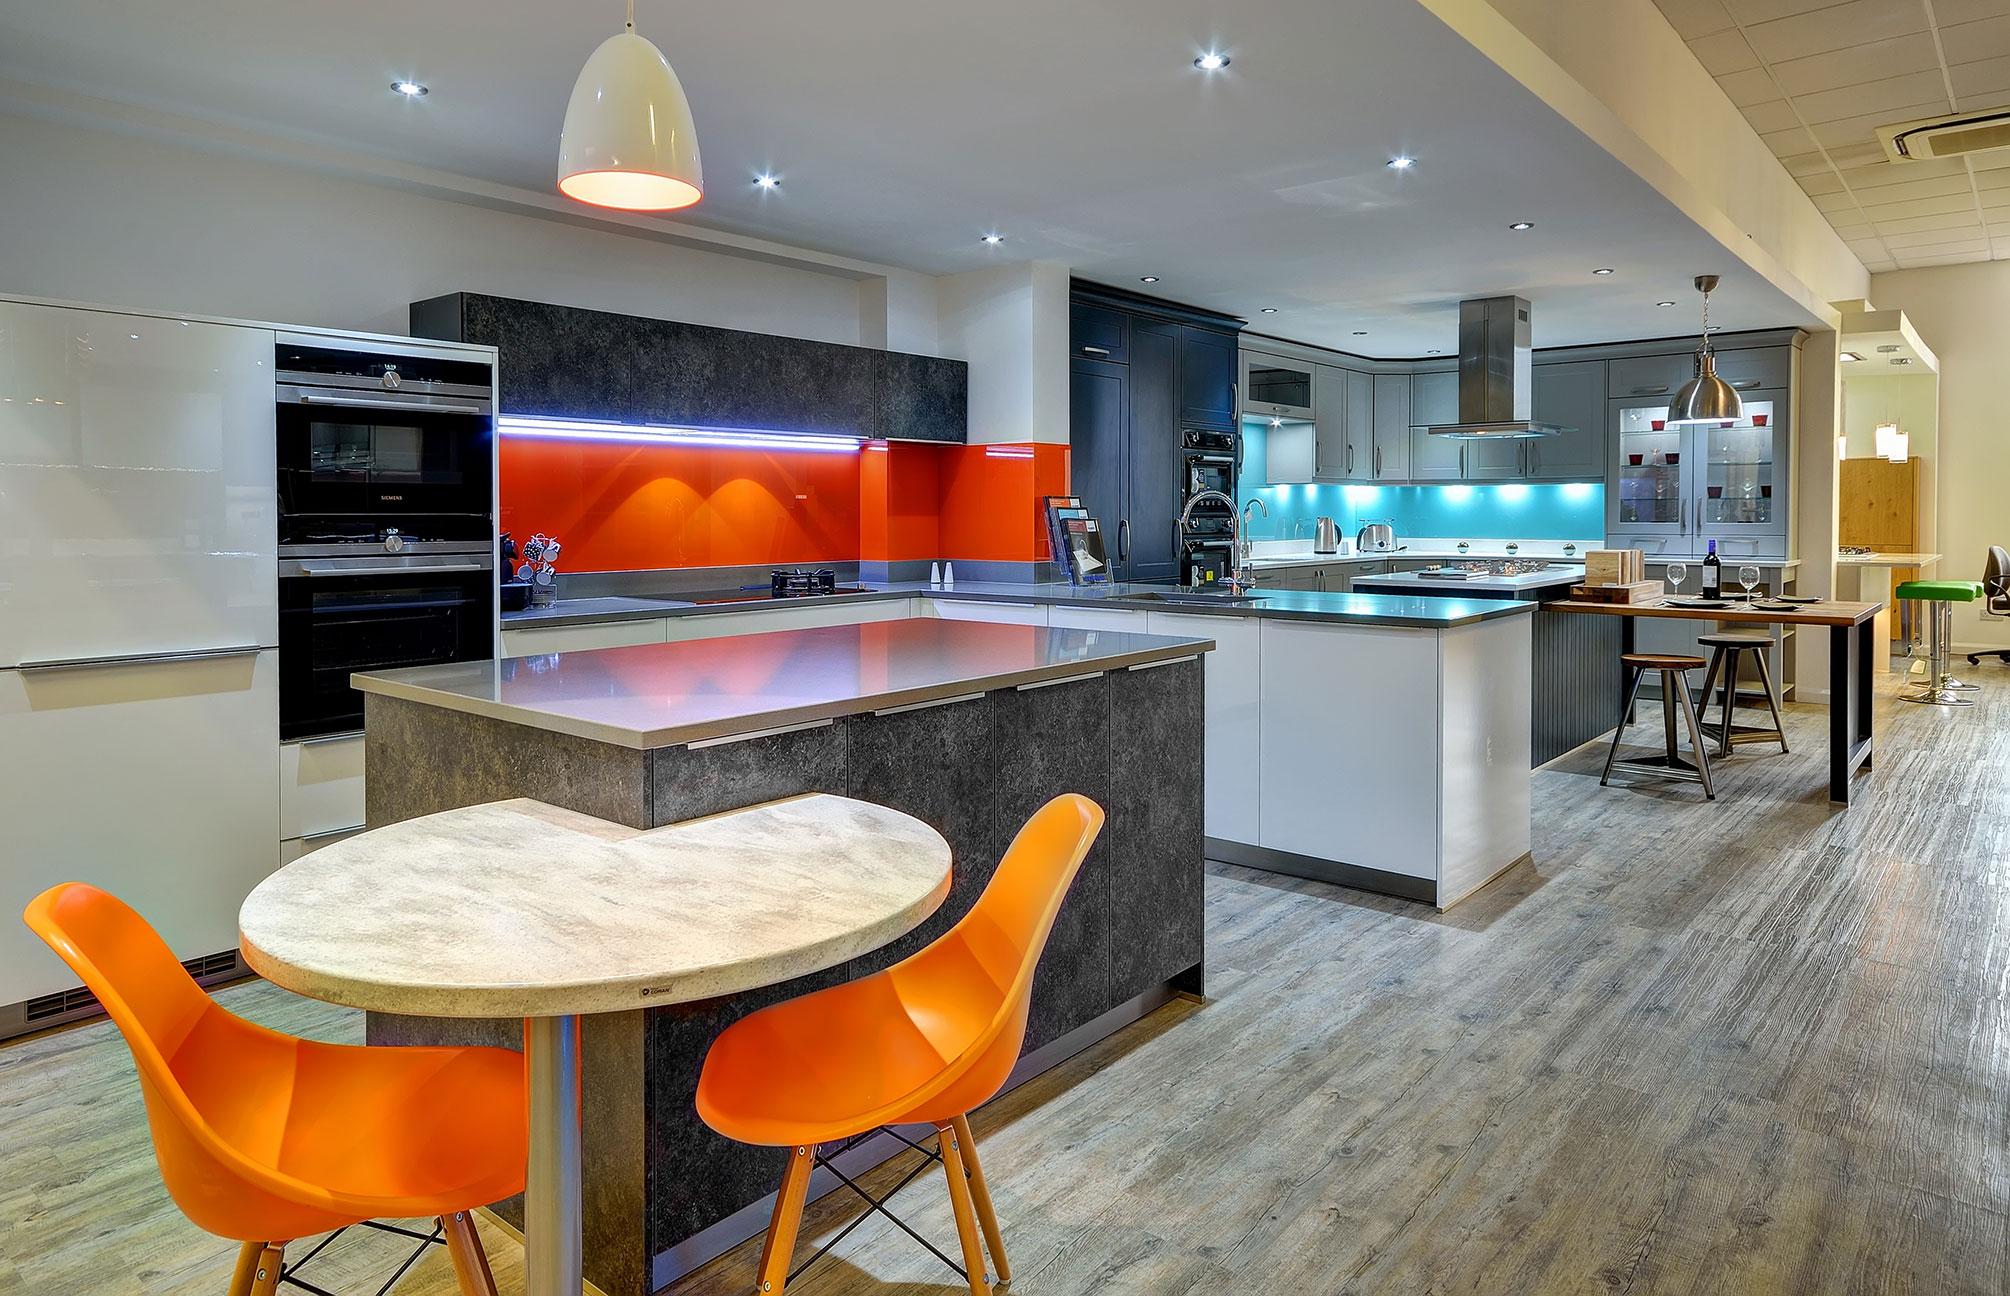 common kitchen design terminology explained - Common Kitchen Designs